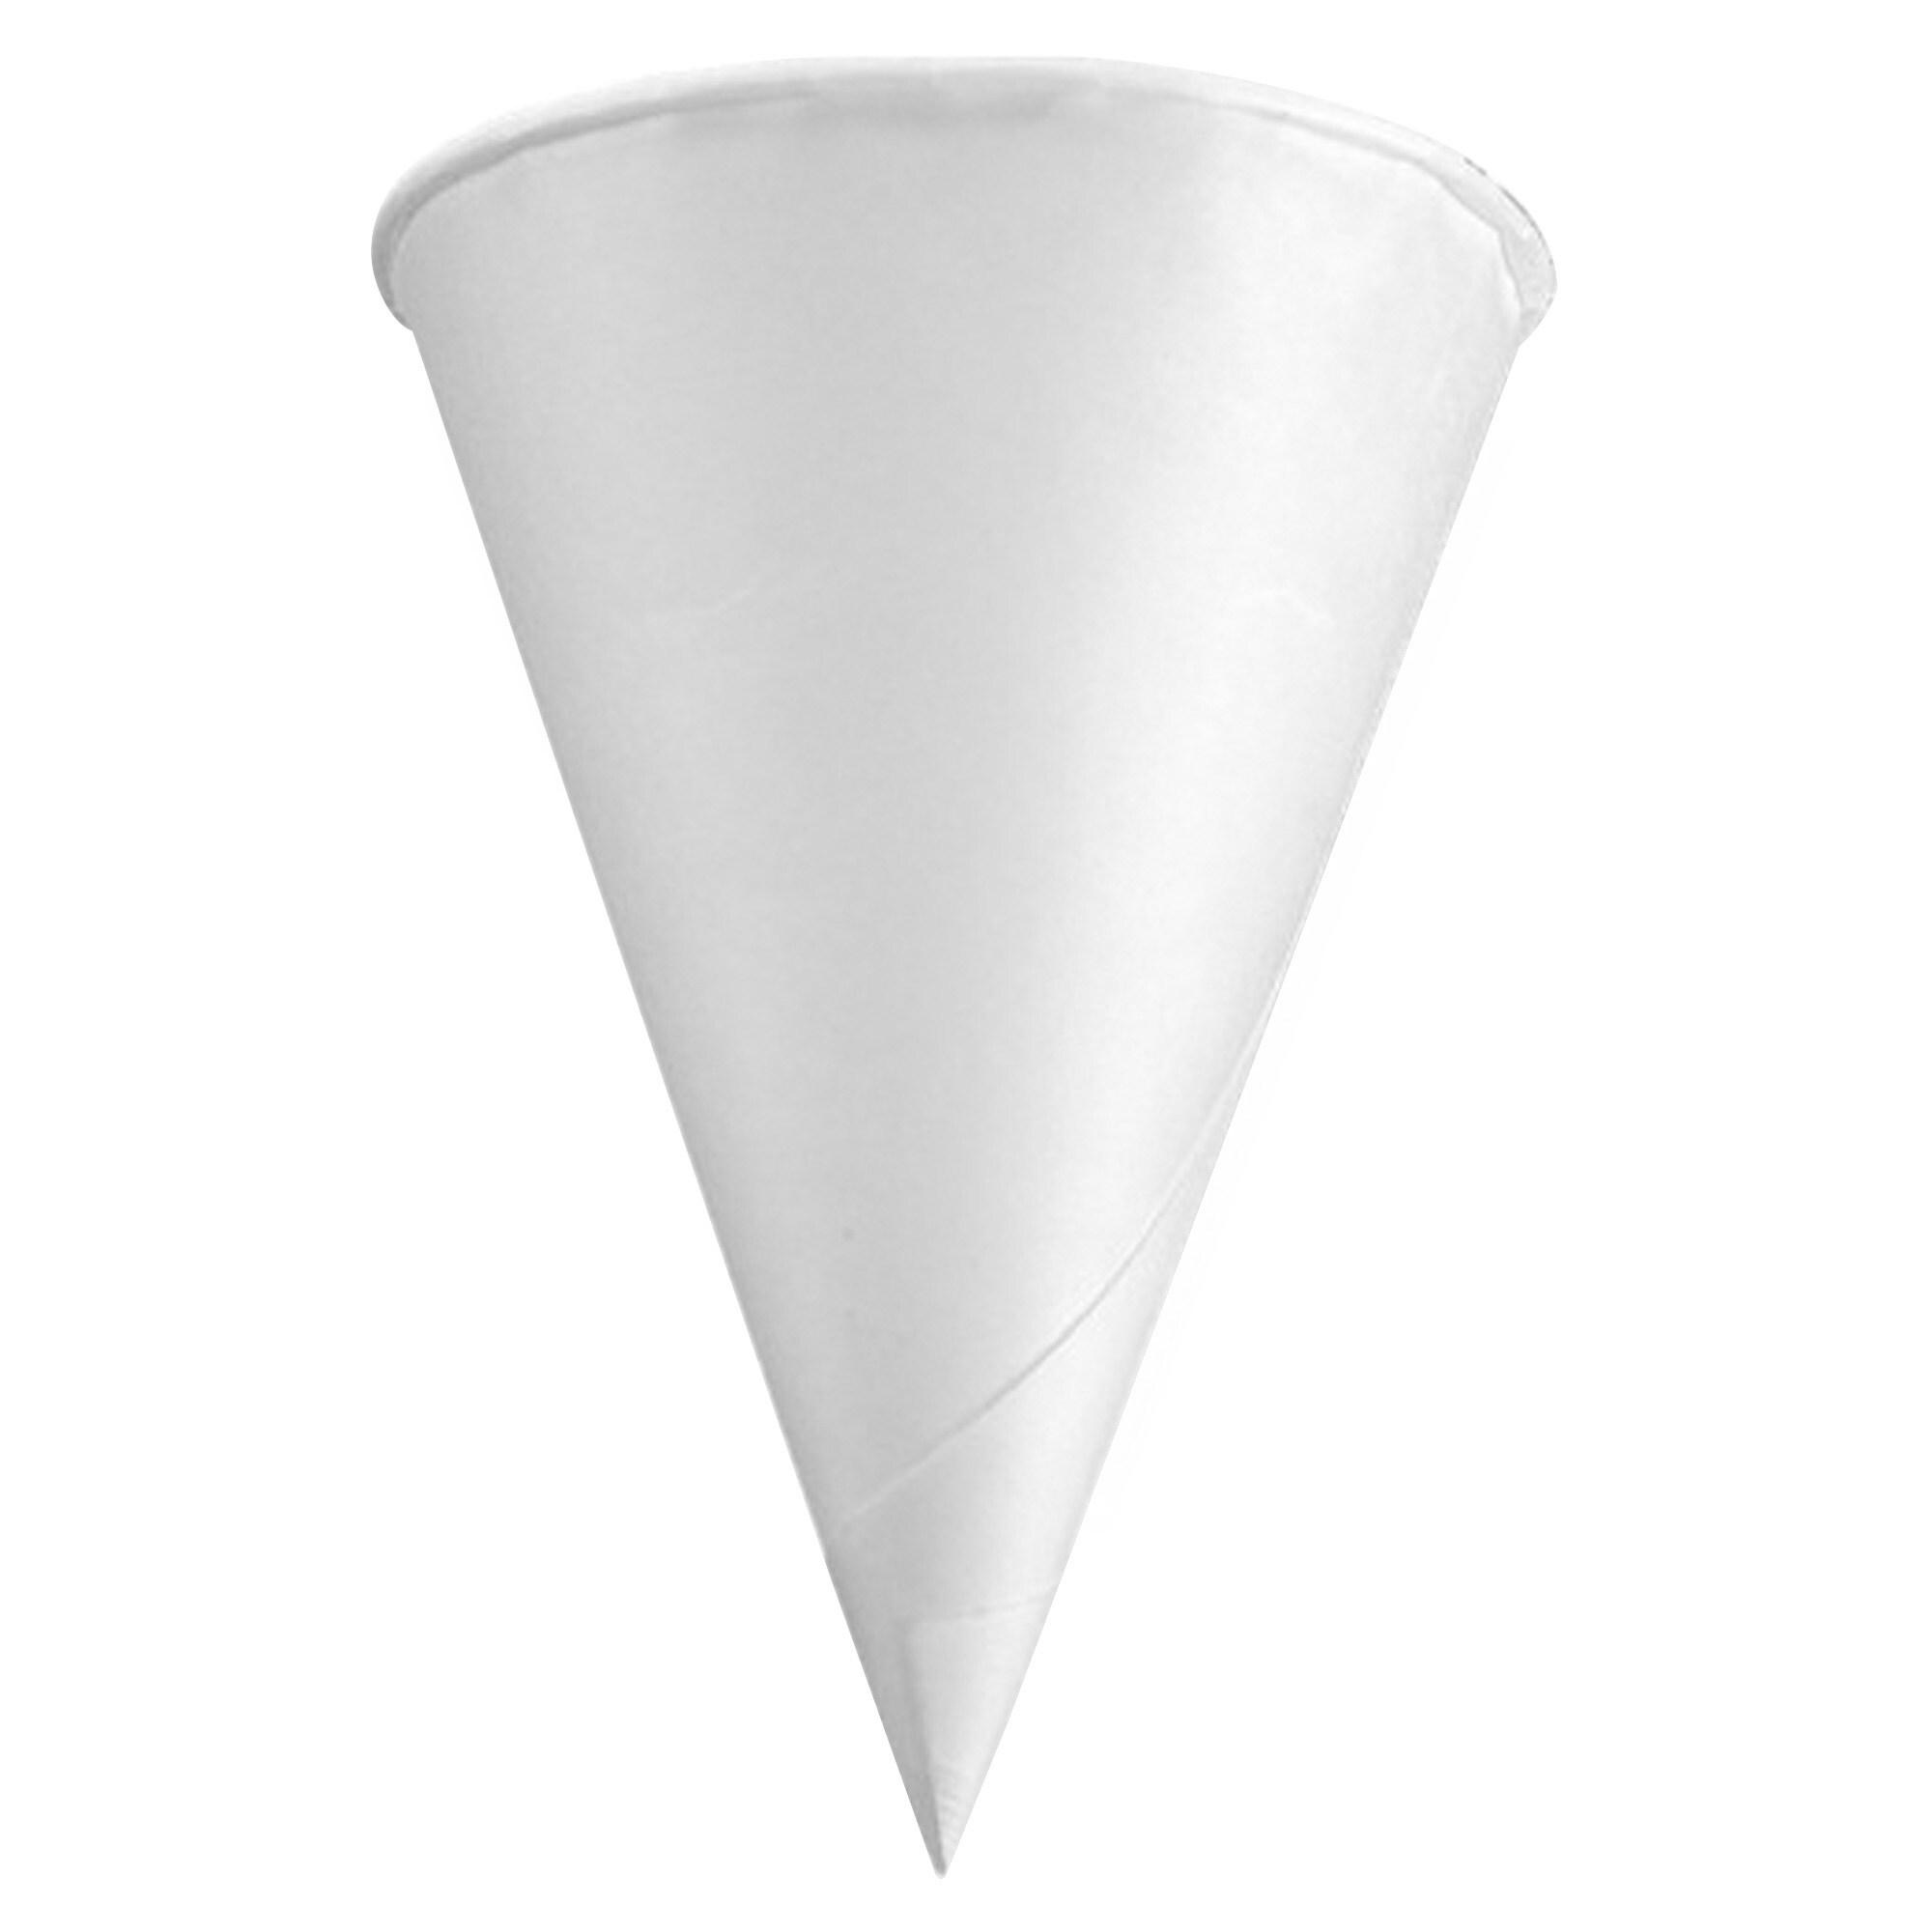 International Konie 4.5 oz KR Rolled Rim Cup - White (200...